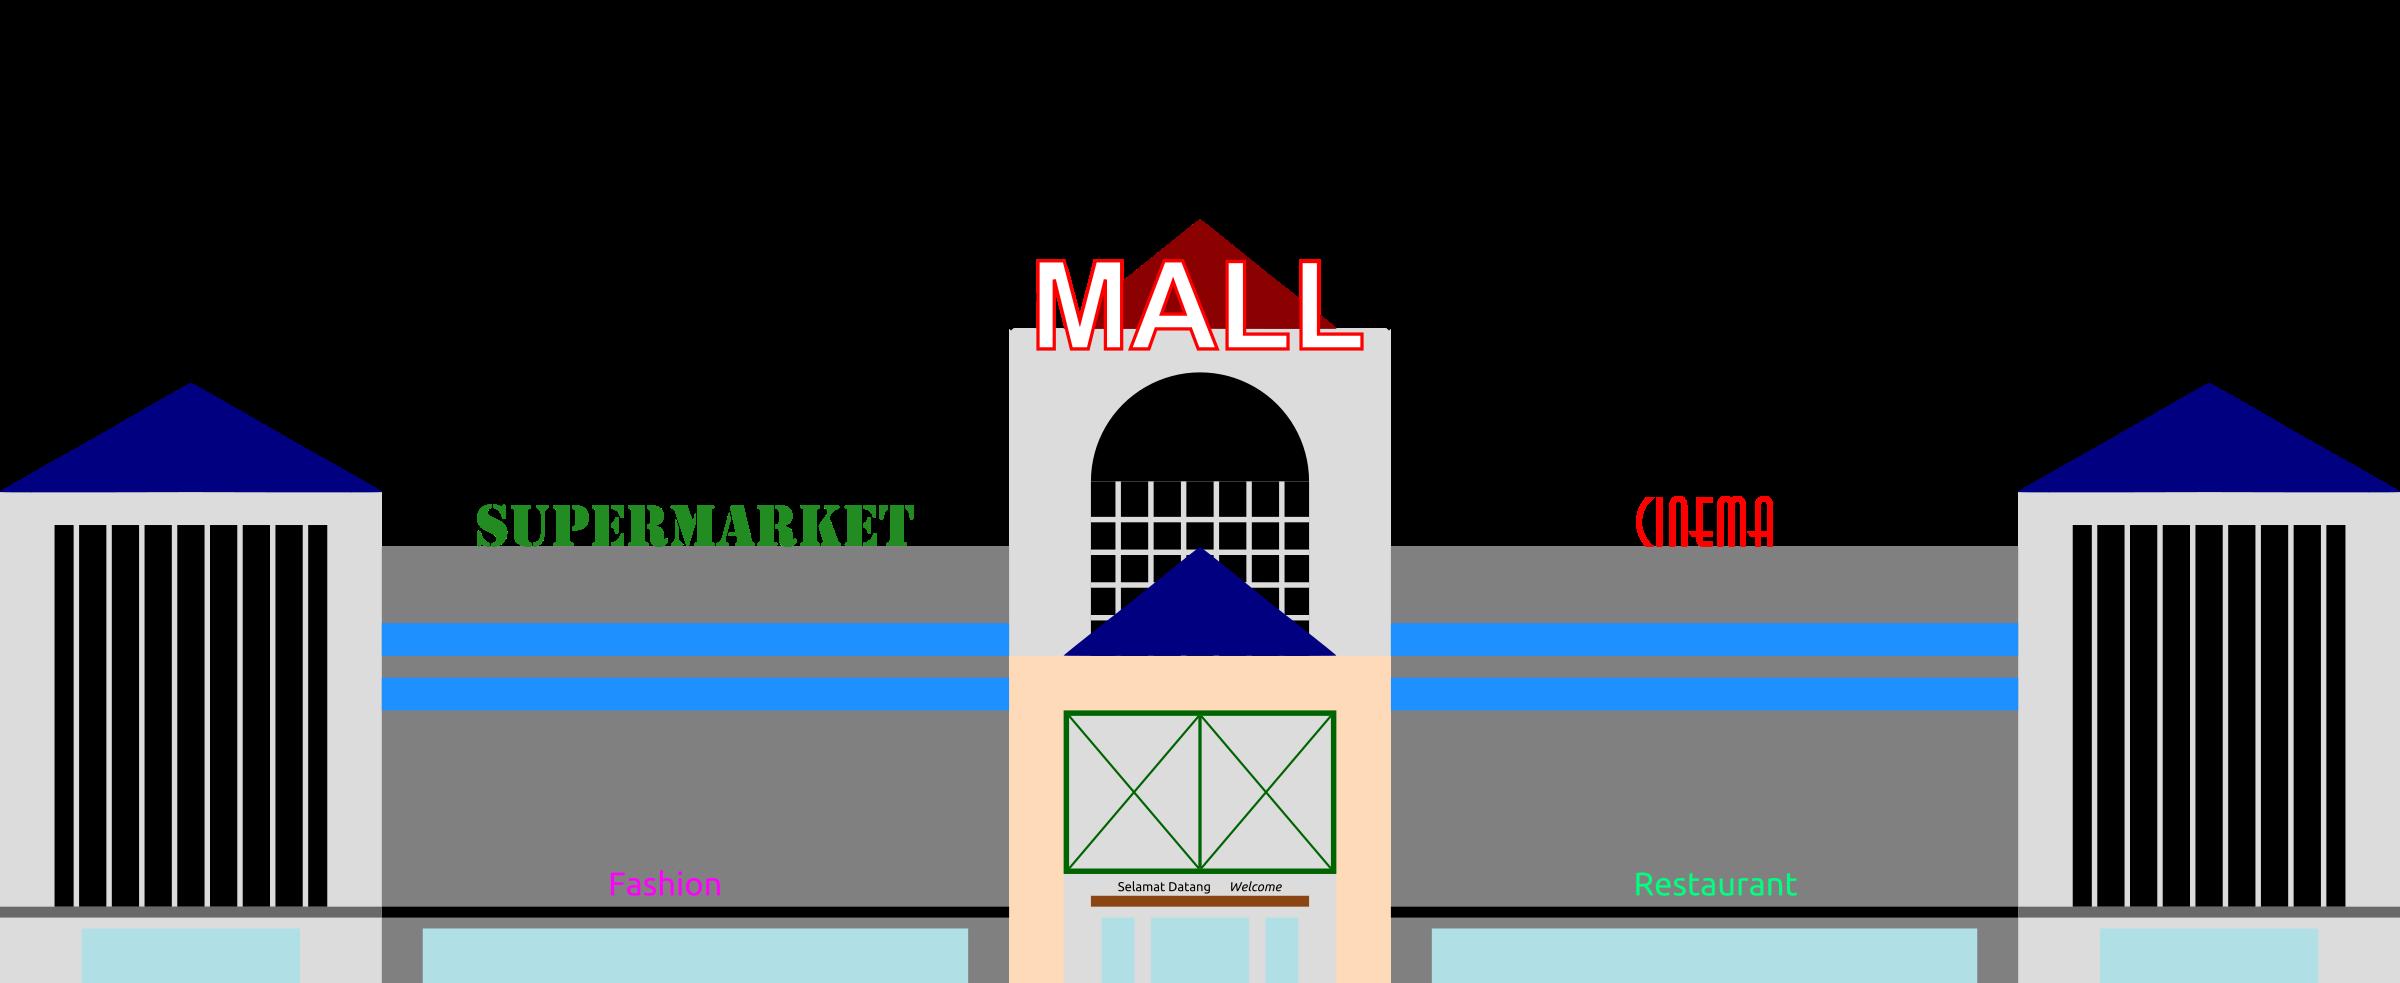 restaurants clipart mall building #140979183